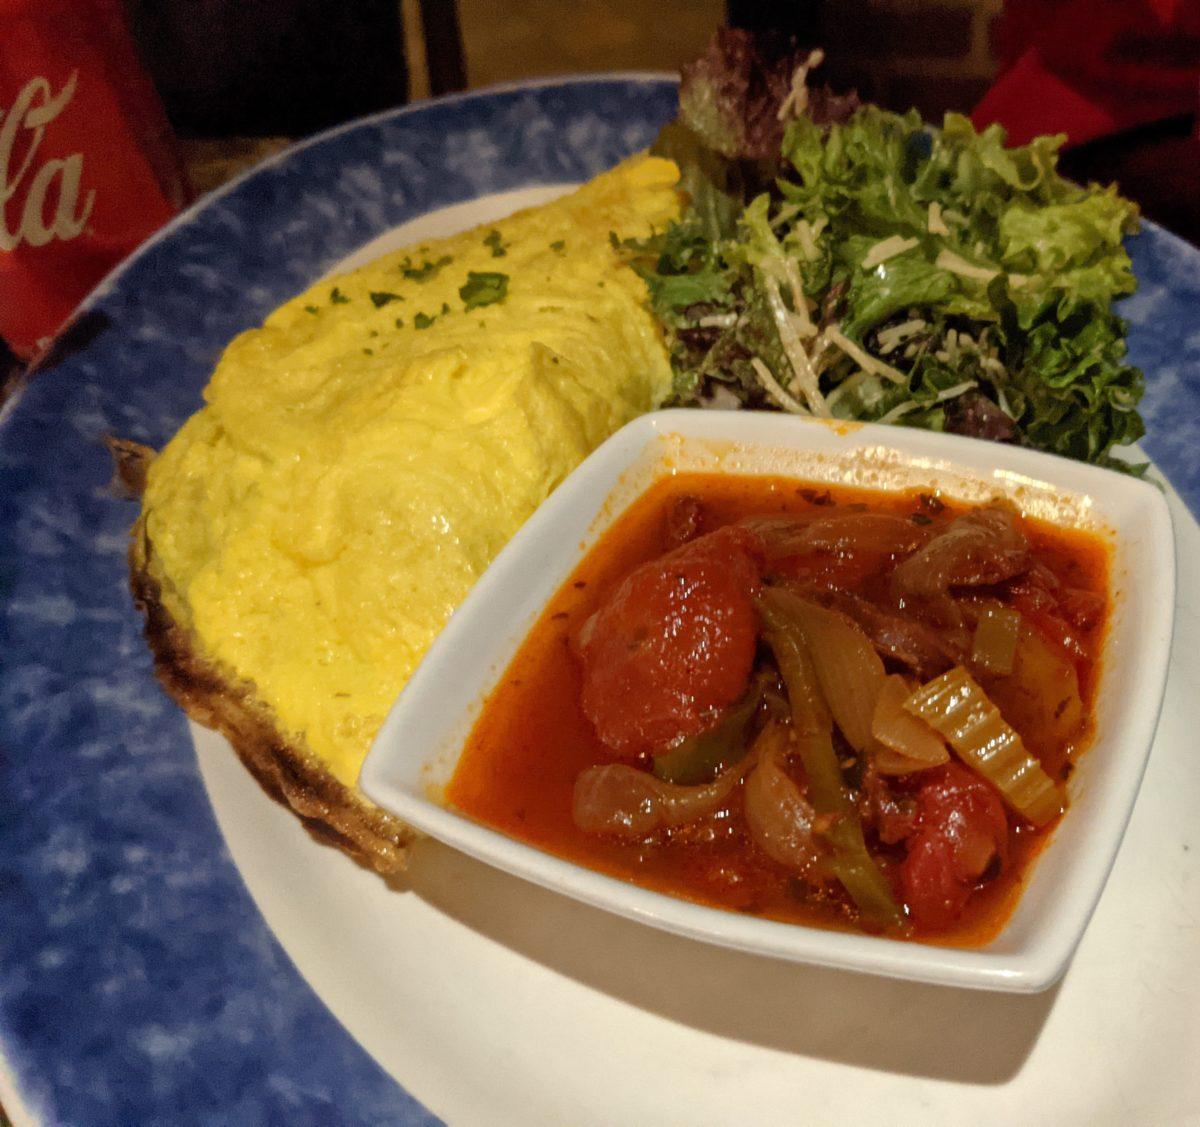 The Bistro Omelette at Blue Talon Bistro in Williamsburg, Virginia has Black Forest ham, cheese & Basque sauce